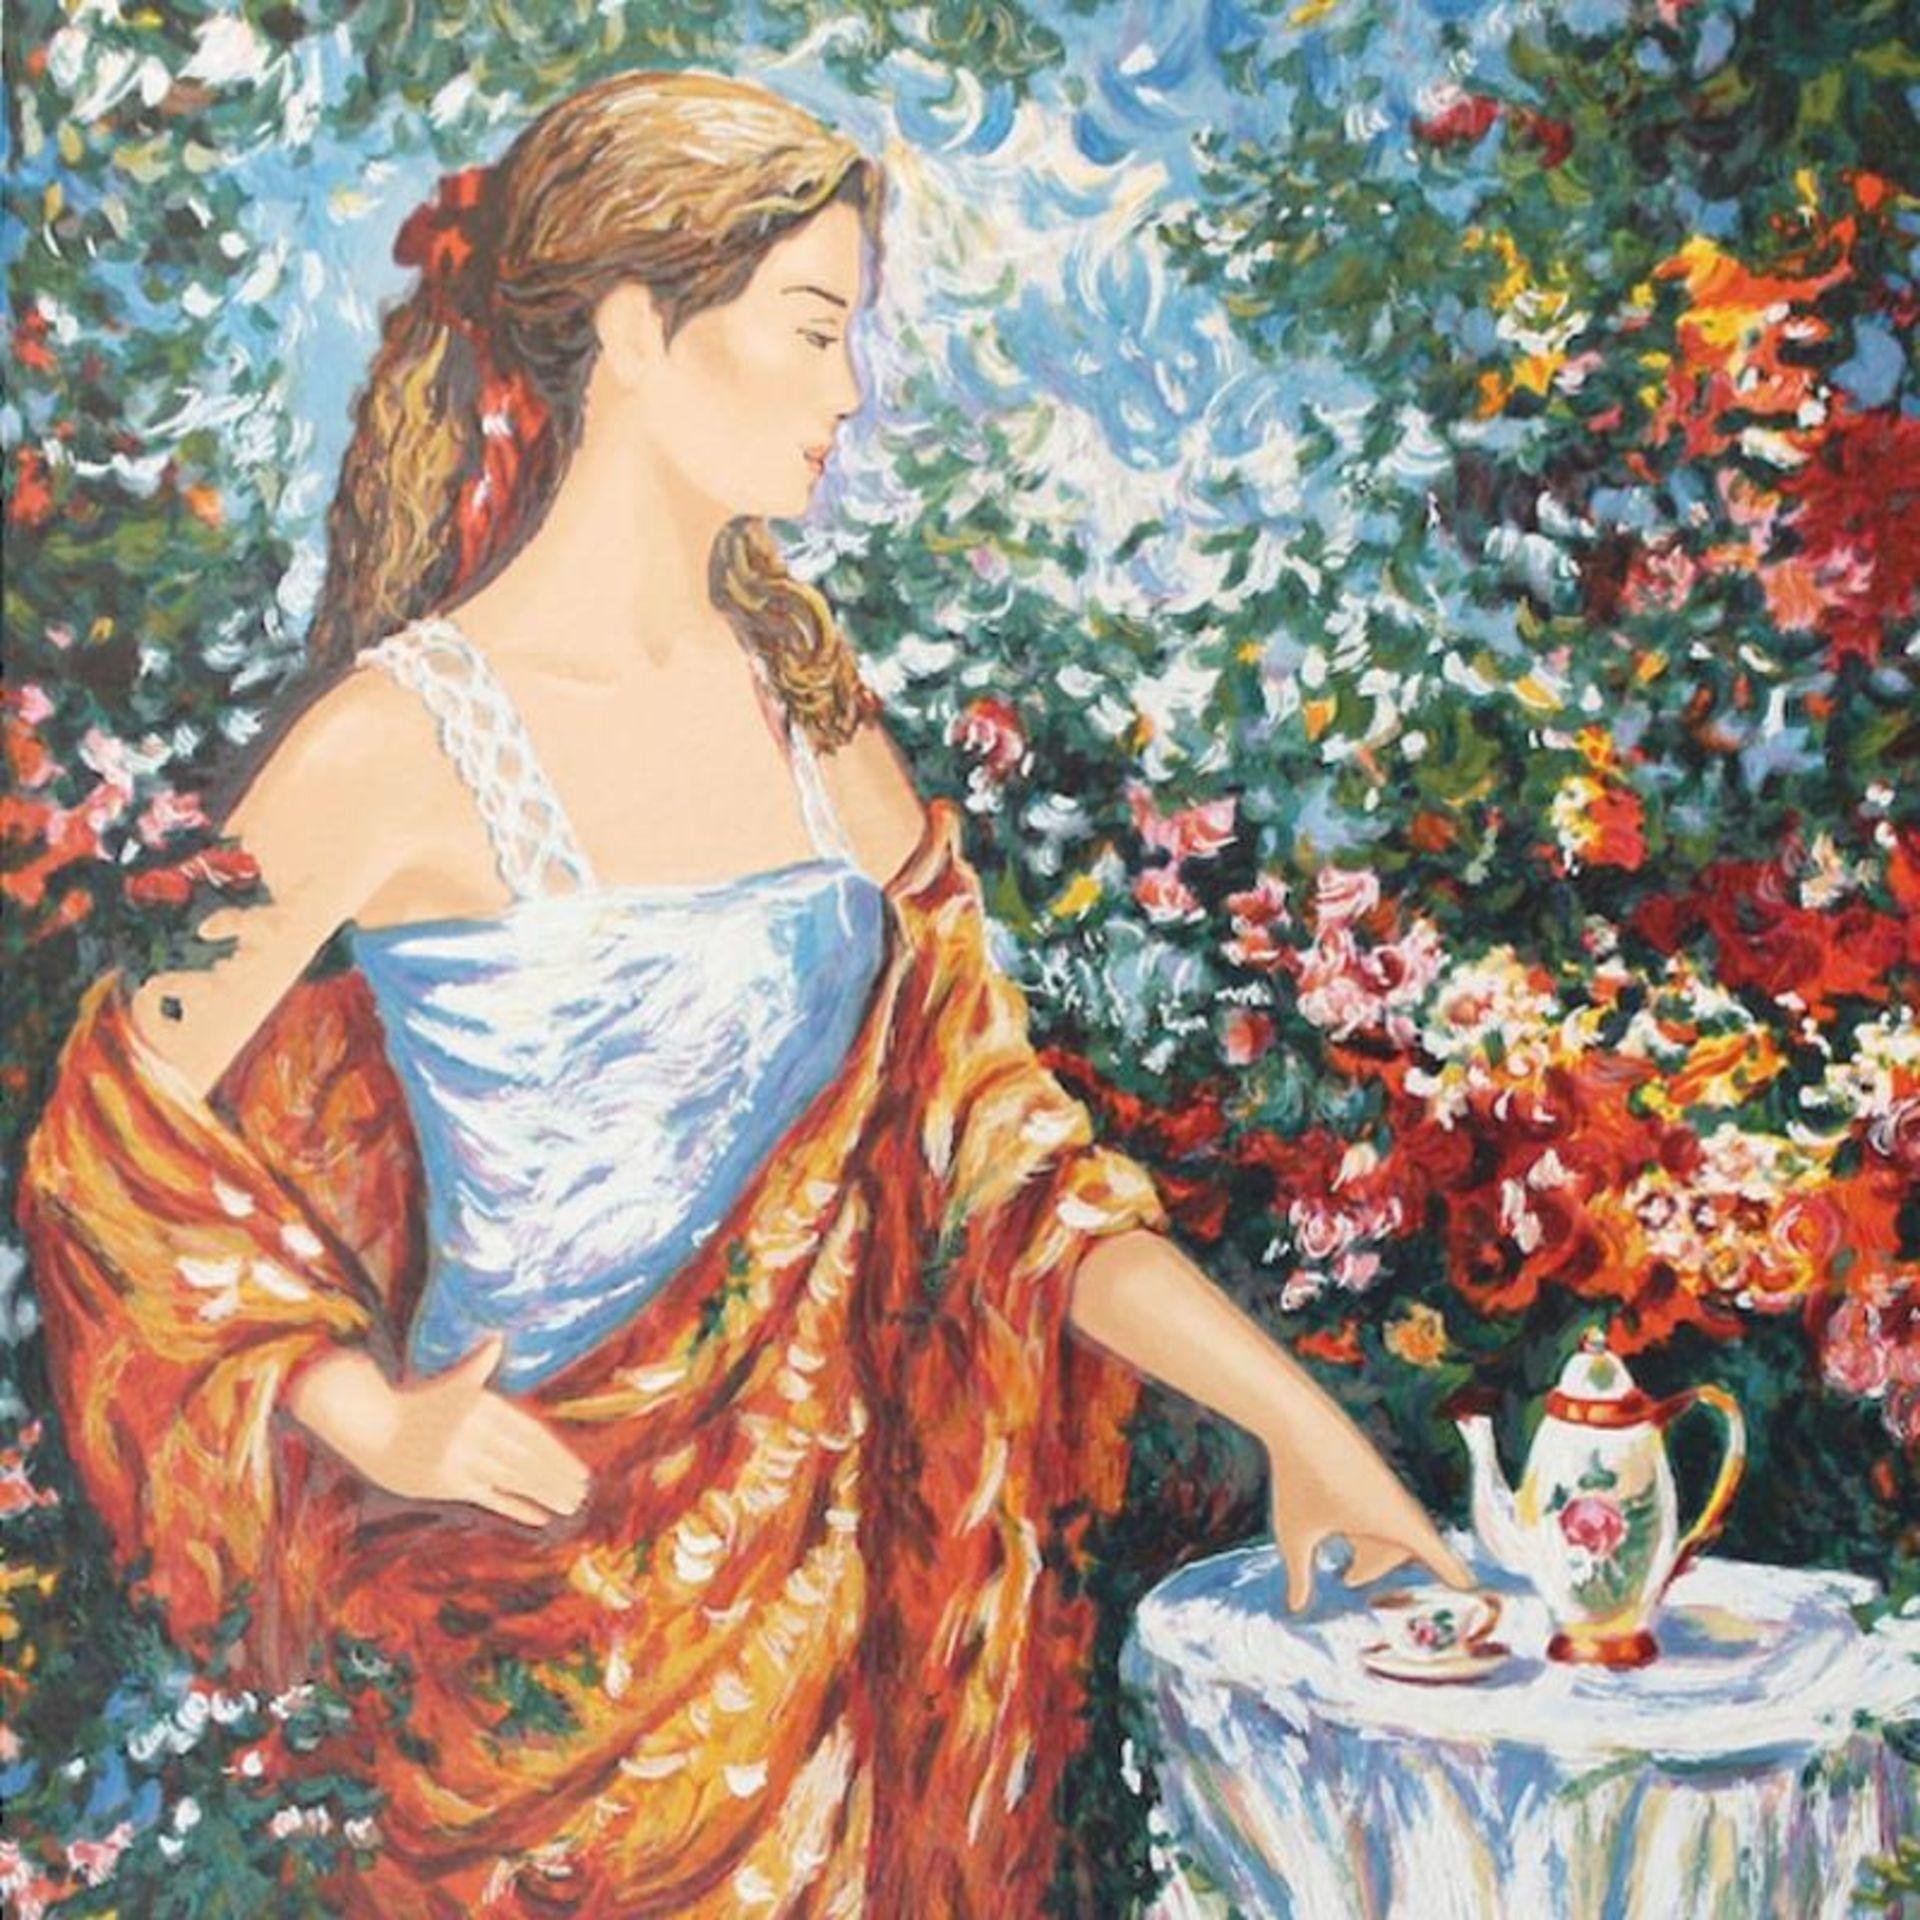 Tea Time by Semeko, Igor - Image 2 of 2